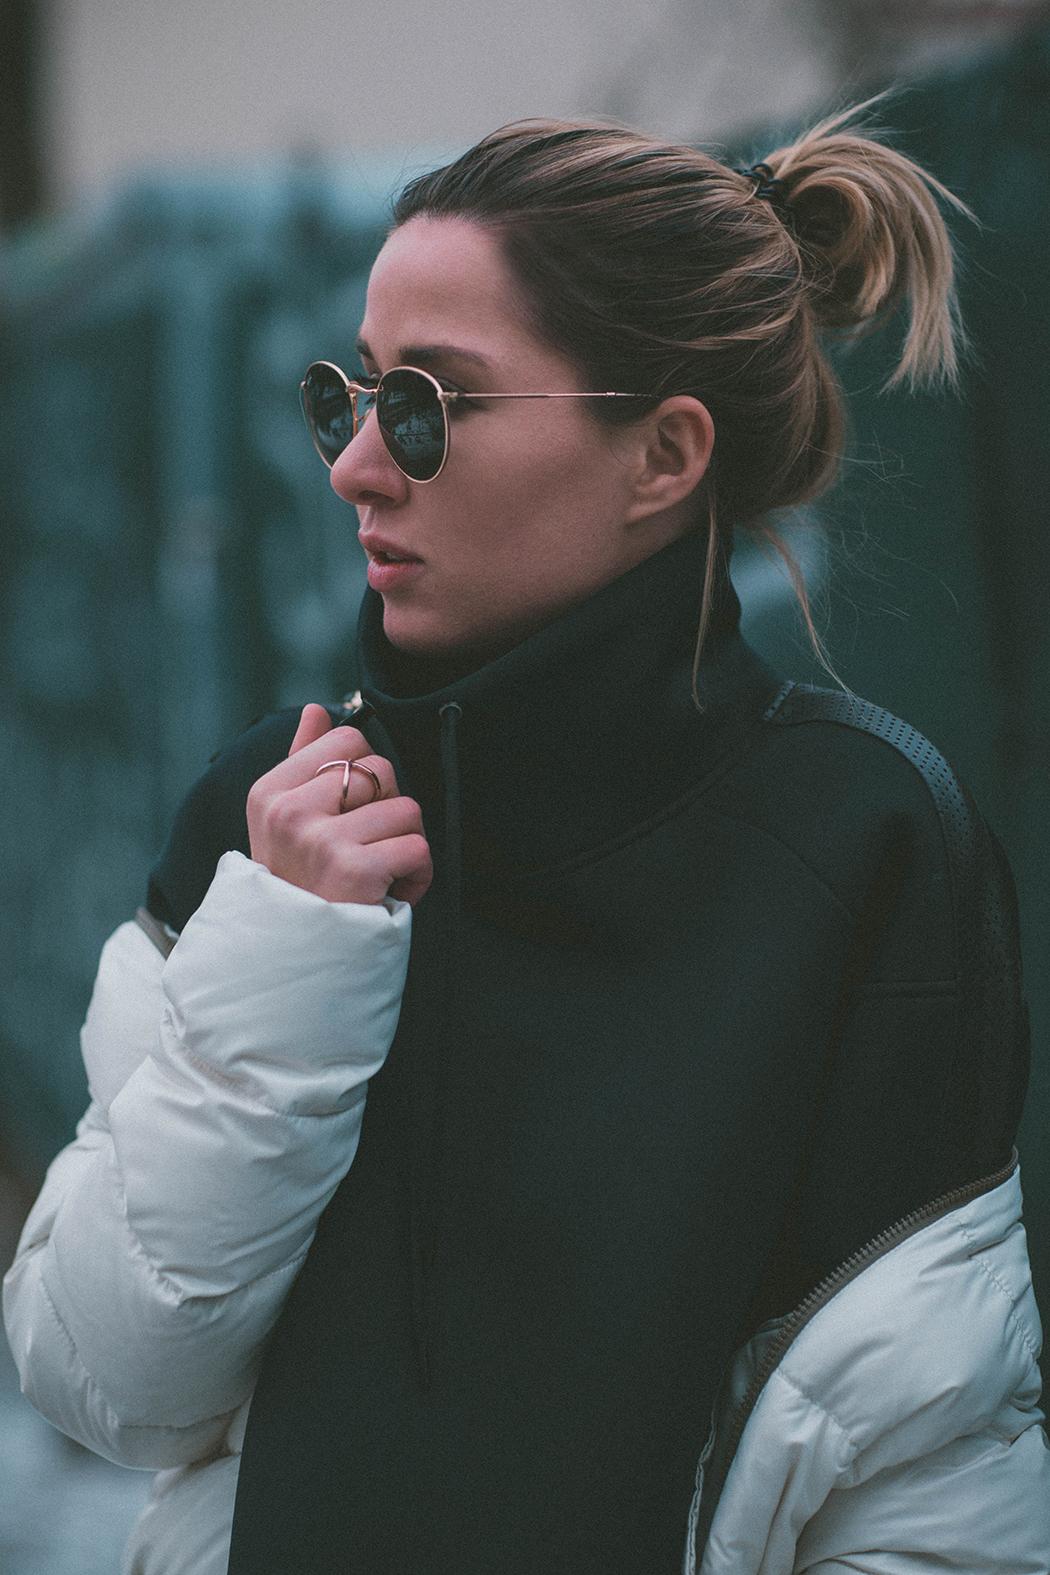 Fashionblog-Fashionblogger-Fashion-Blog-Blogger-Mode-Fashion-Week-Berlin-2017-Lindarella20170120_0007